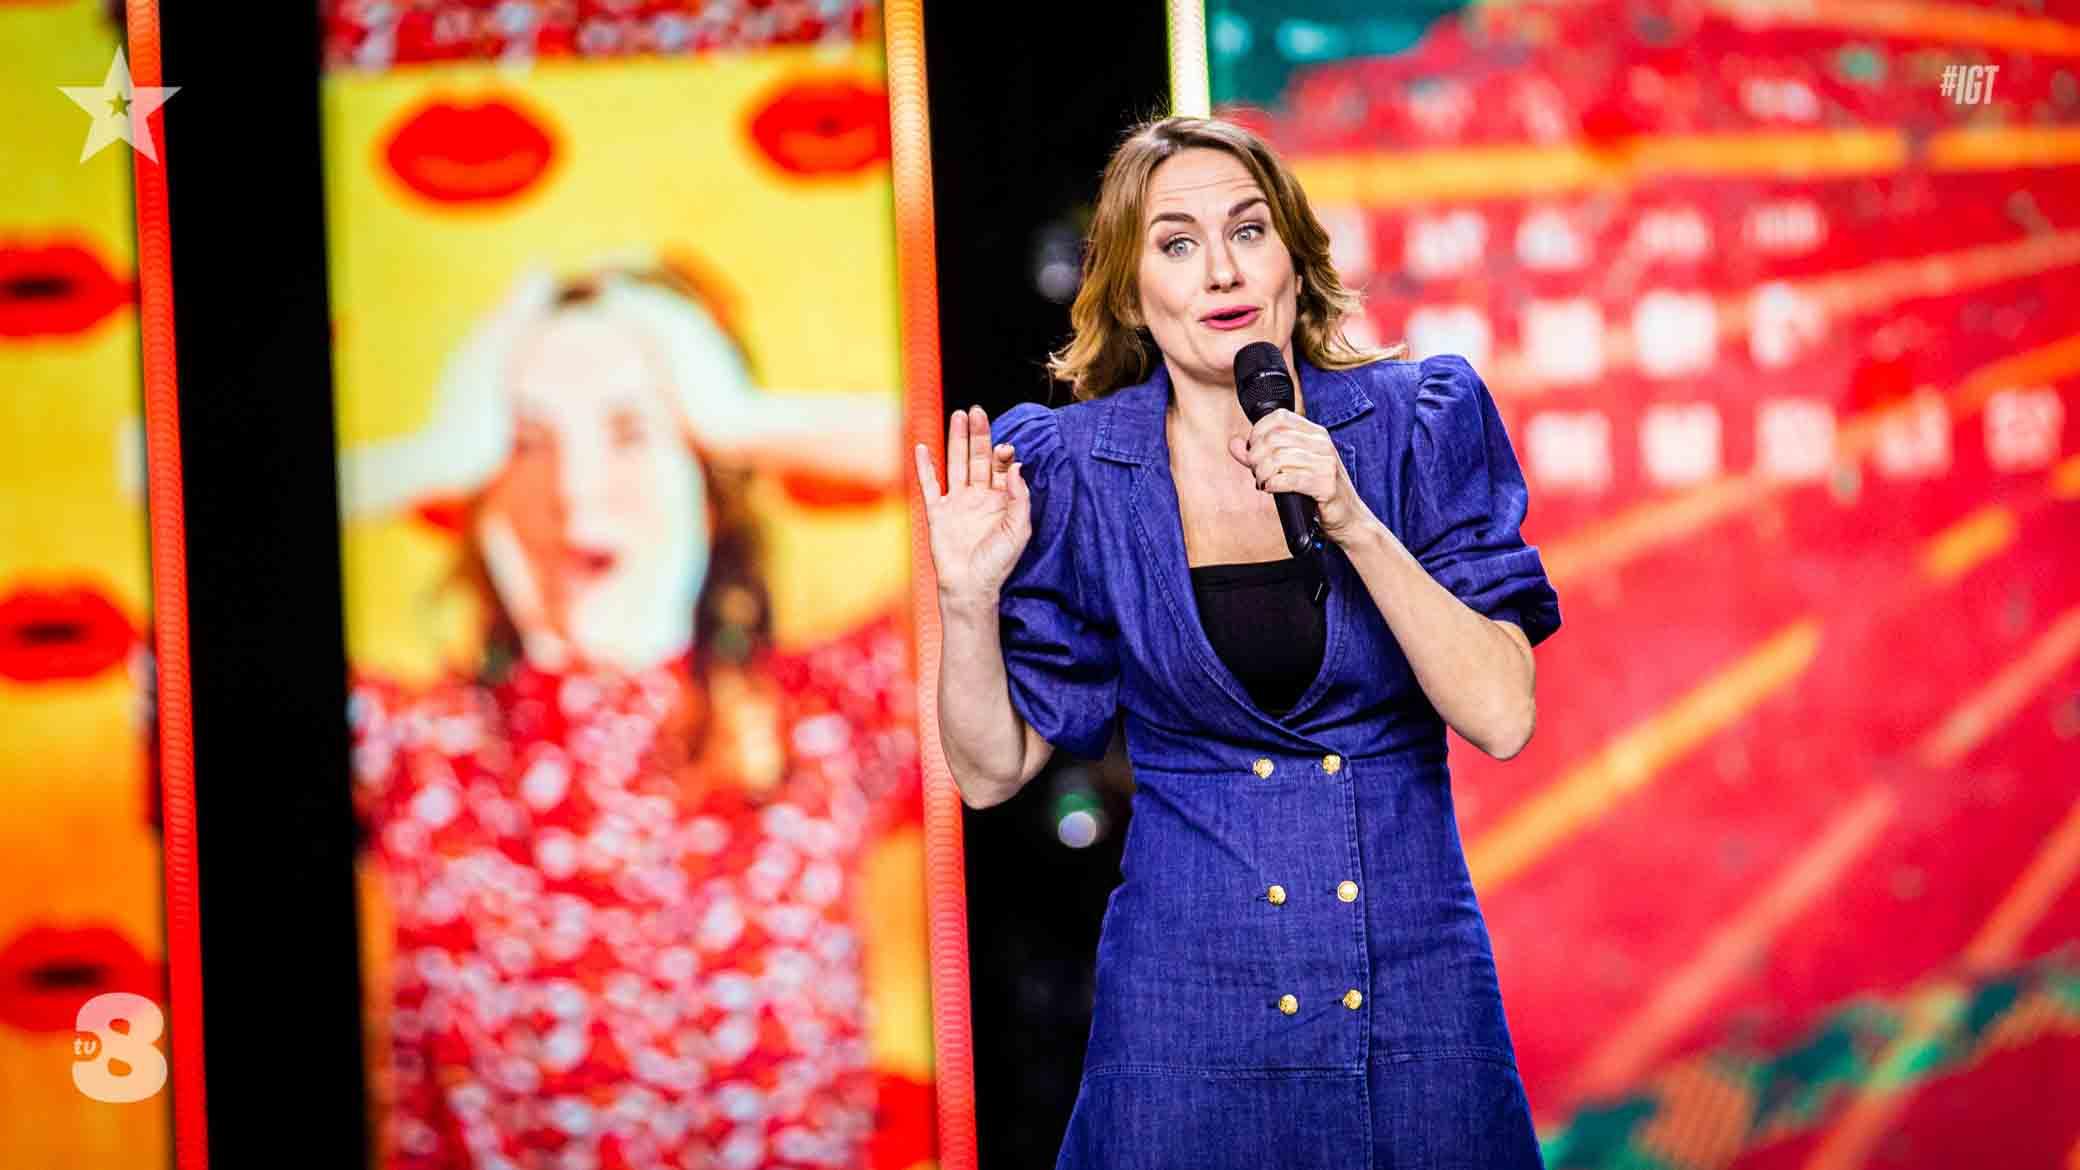 Italia's Got Talent - Vota Laura in Finale